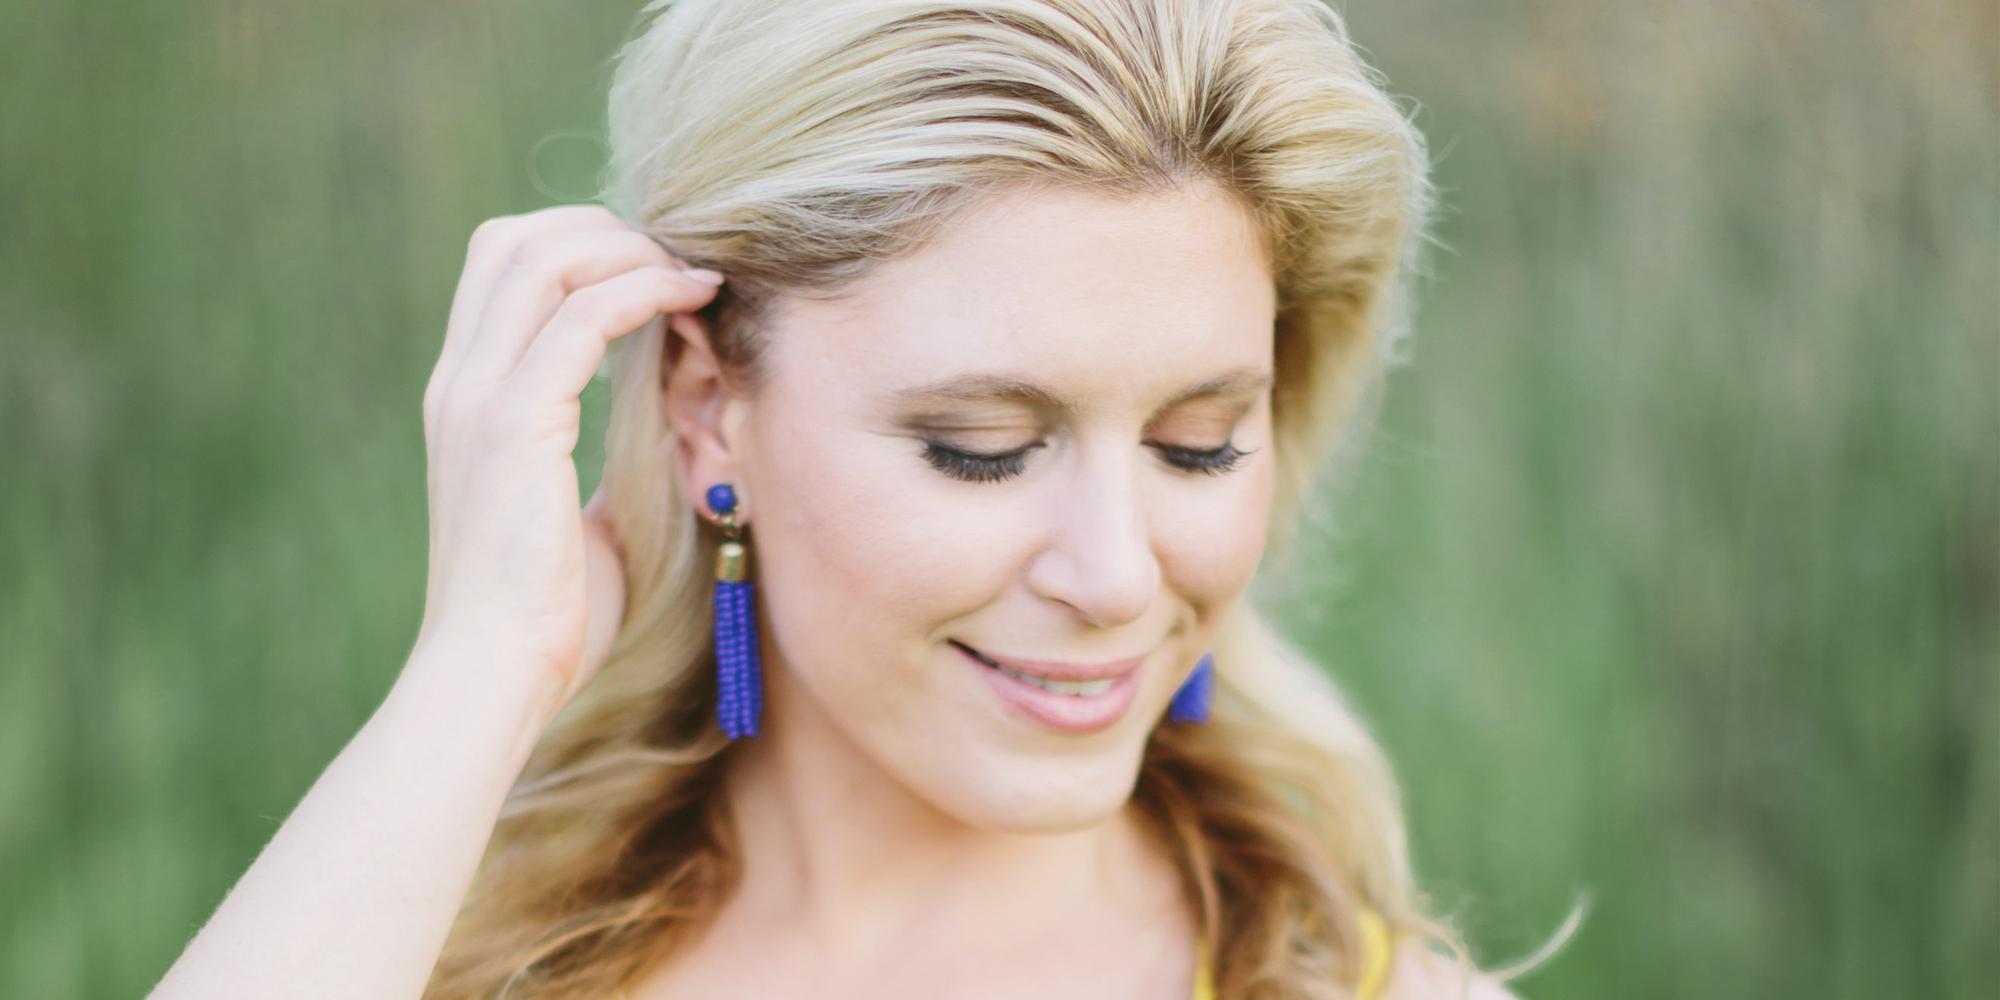 Au Naturale Cosmetics Pumps Up Whole Foods' Natural Makeup Assortment